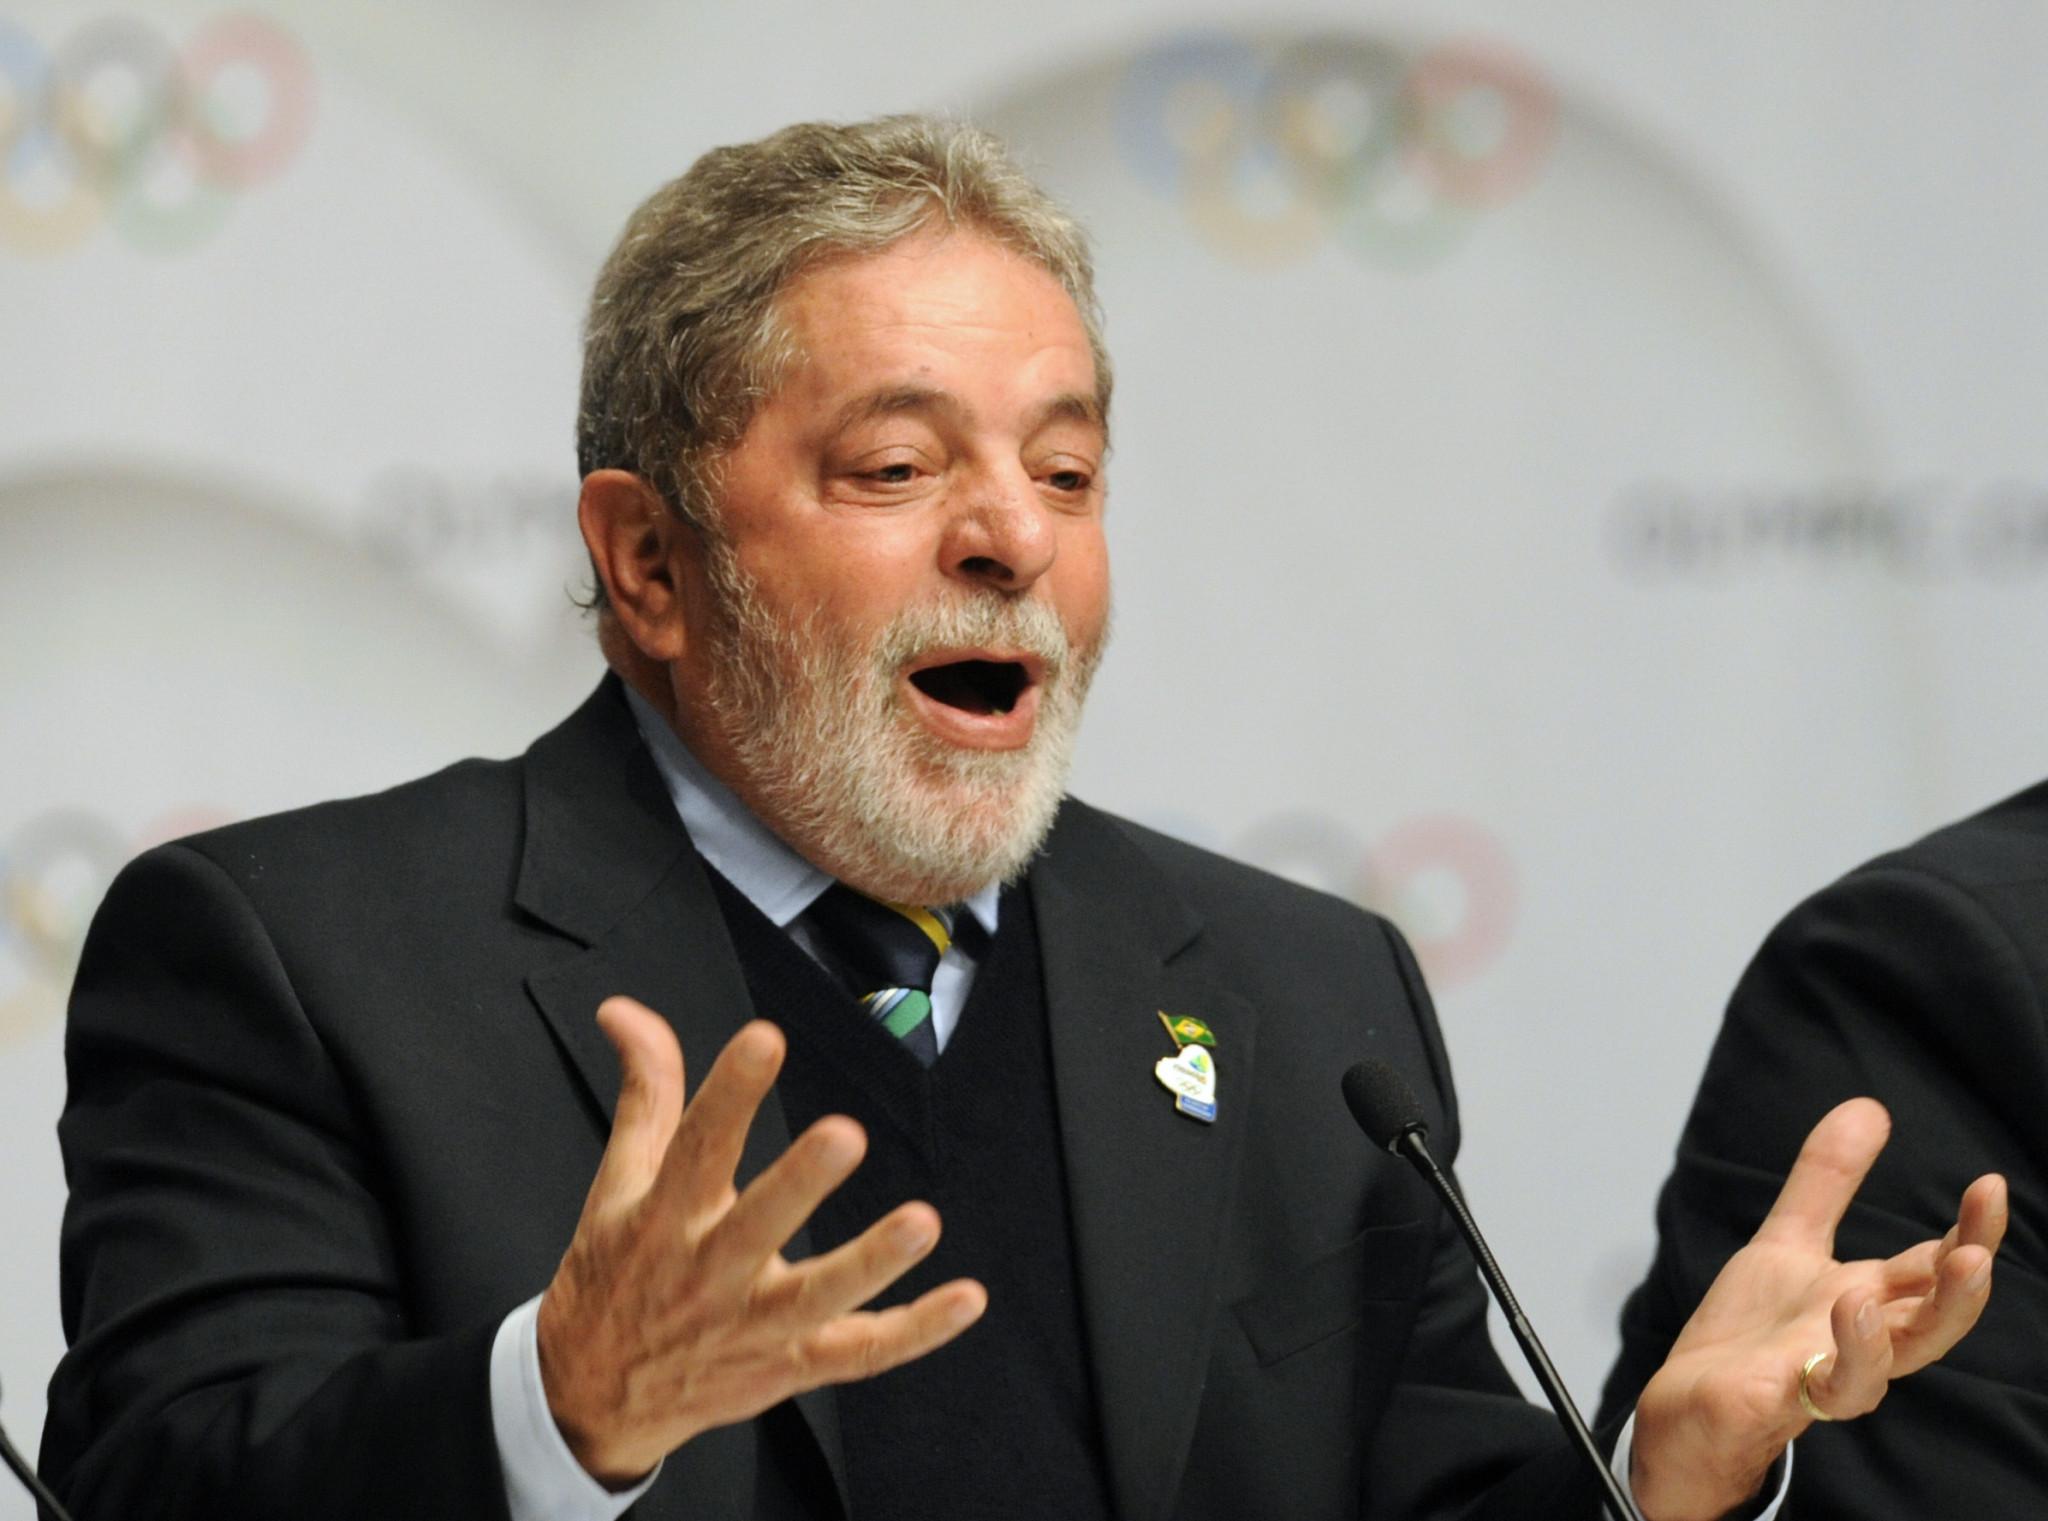 Ex-Brazilian President Lula called to testify on Rio 2016 vote-buying investigation